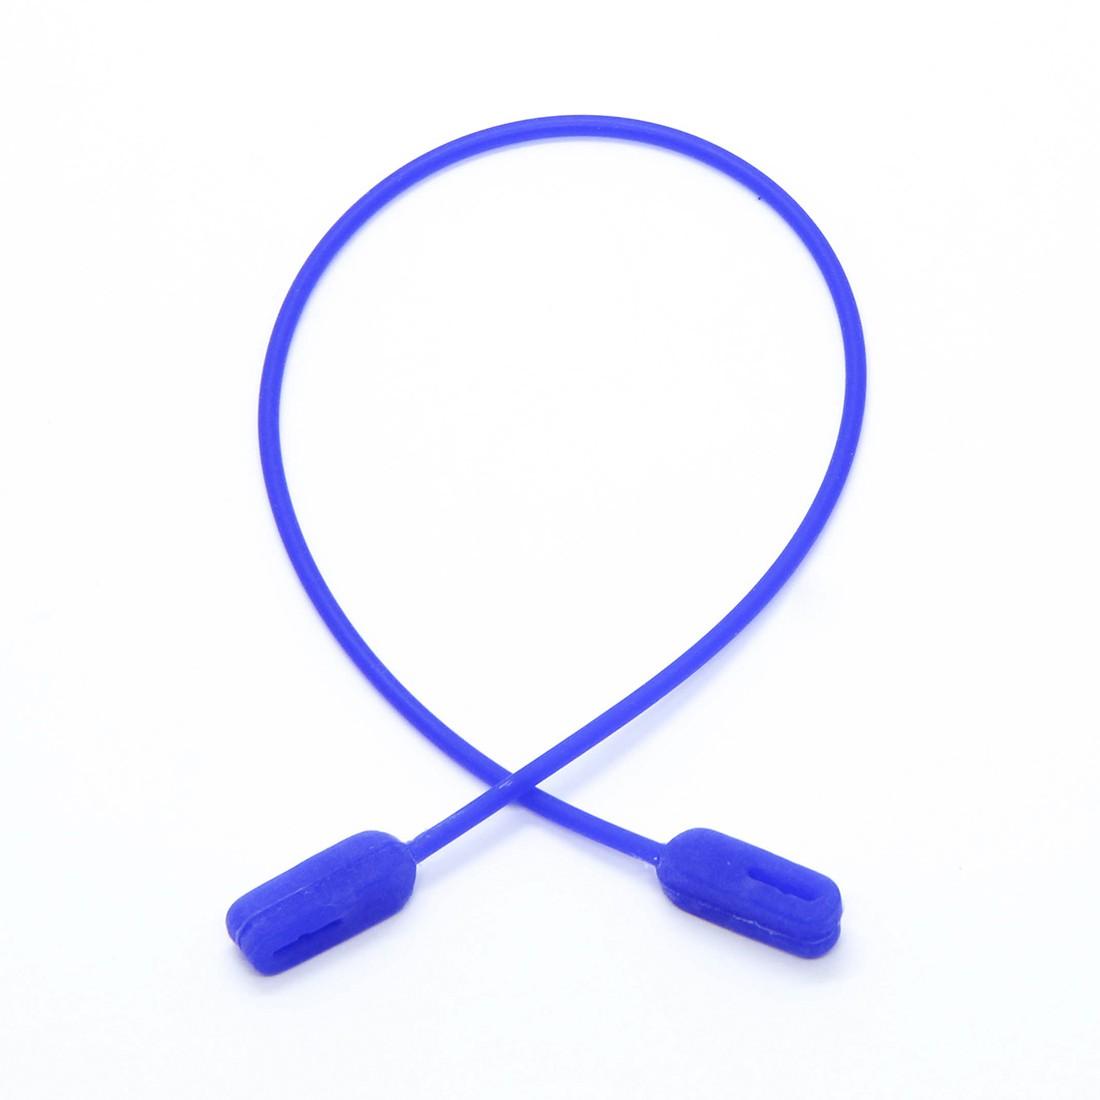 Sicurezza Grip J£nior Silicone 30cm Cor Azul